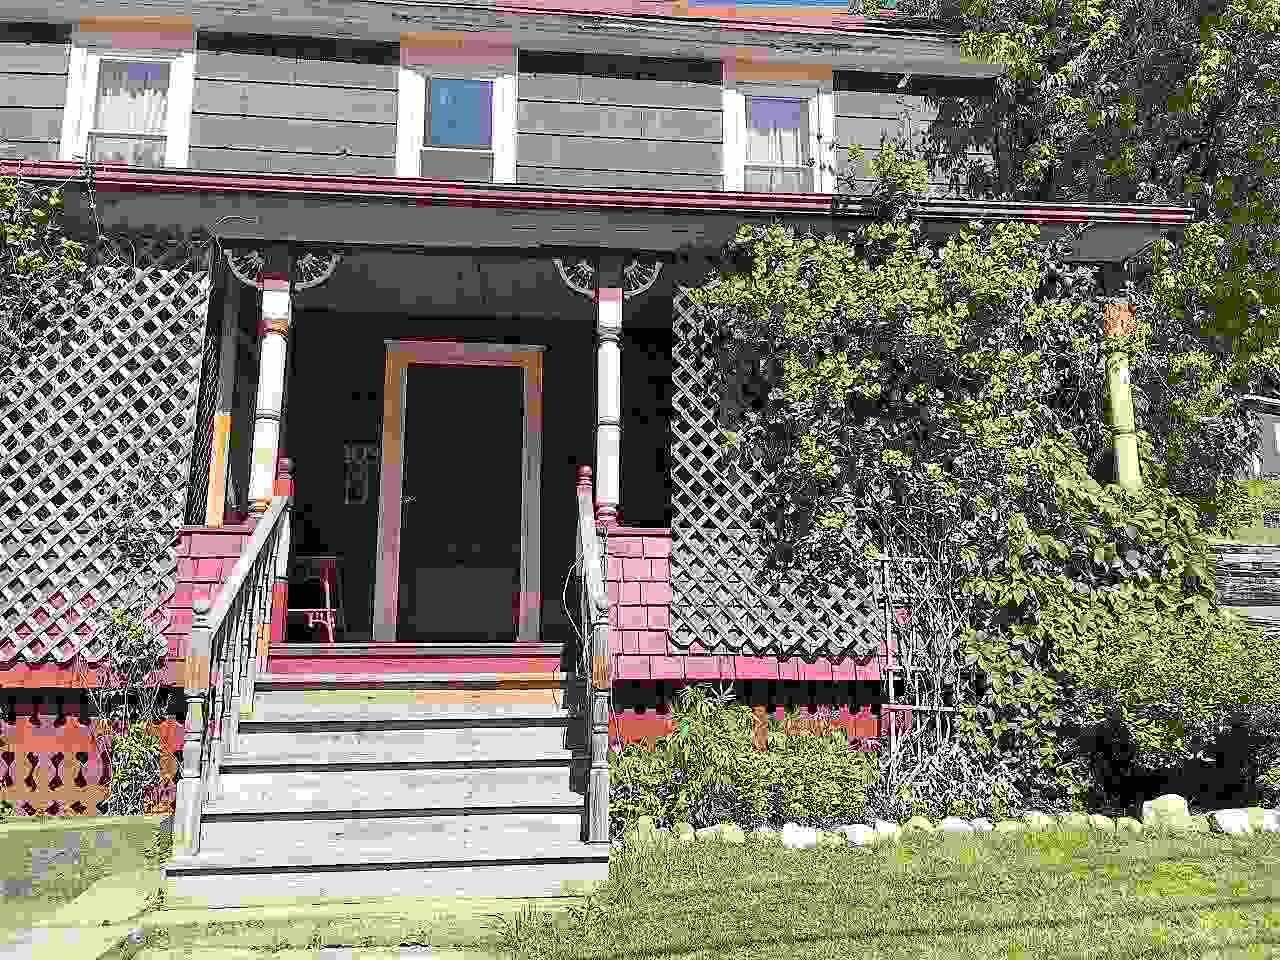 109 Caledonia Street, St. Johnsbury, VT - USA (photo 1)